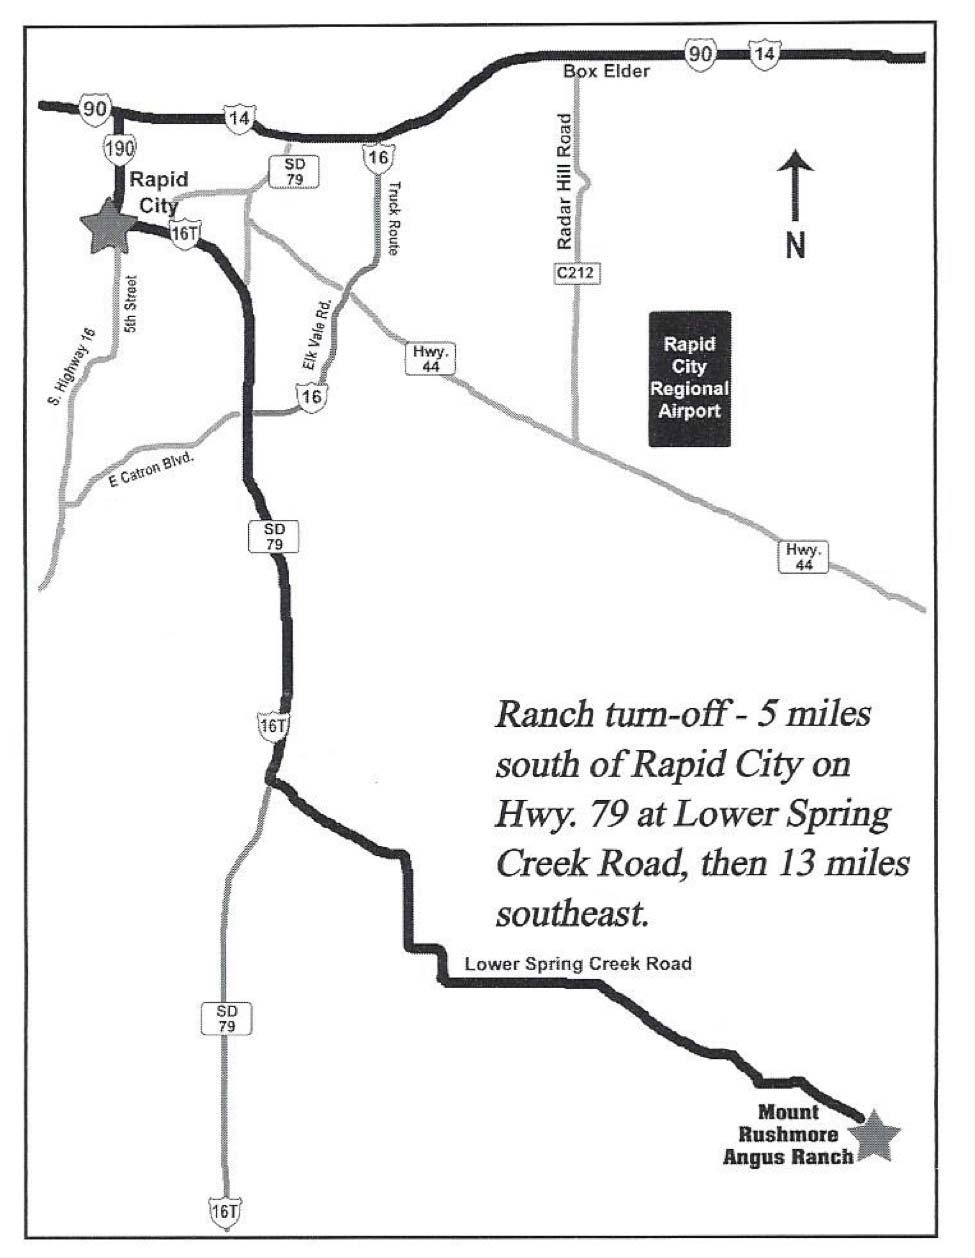 Mt. Rushmore Angus Ranch